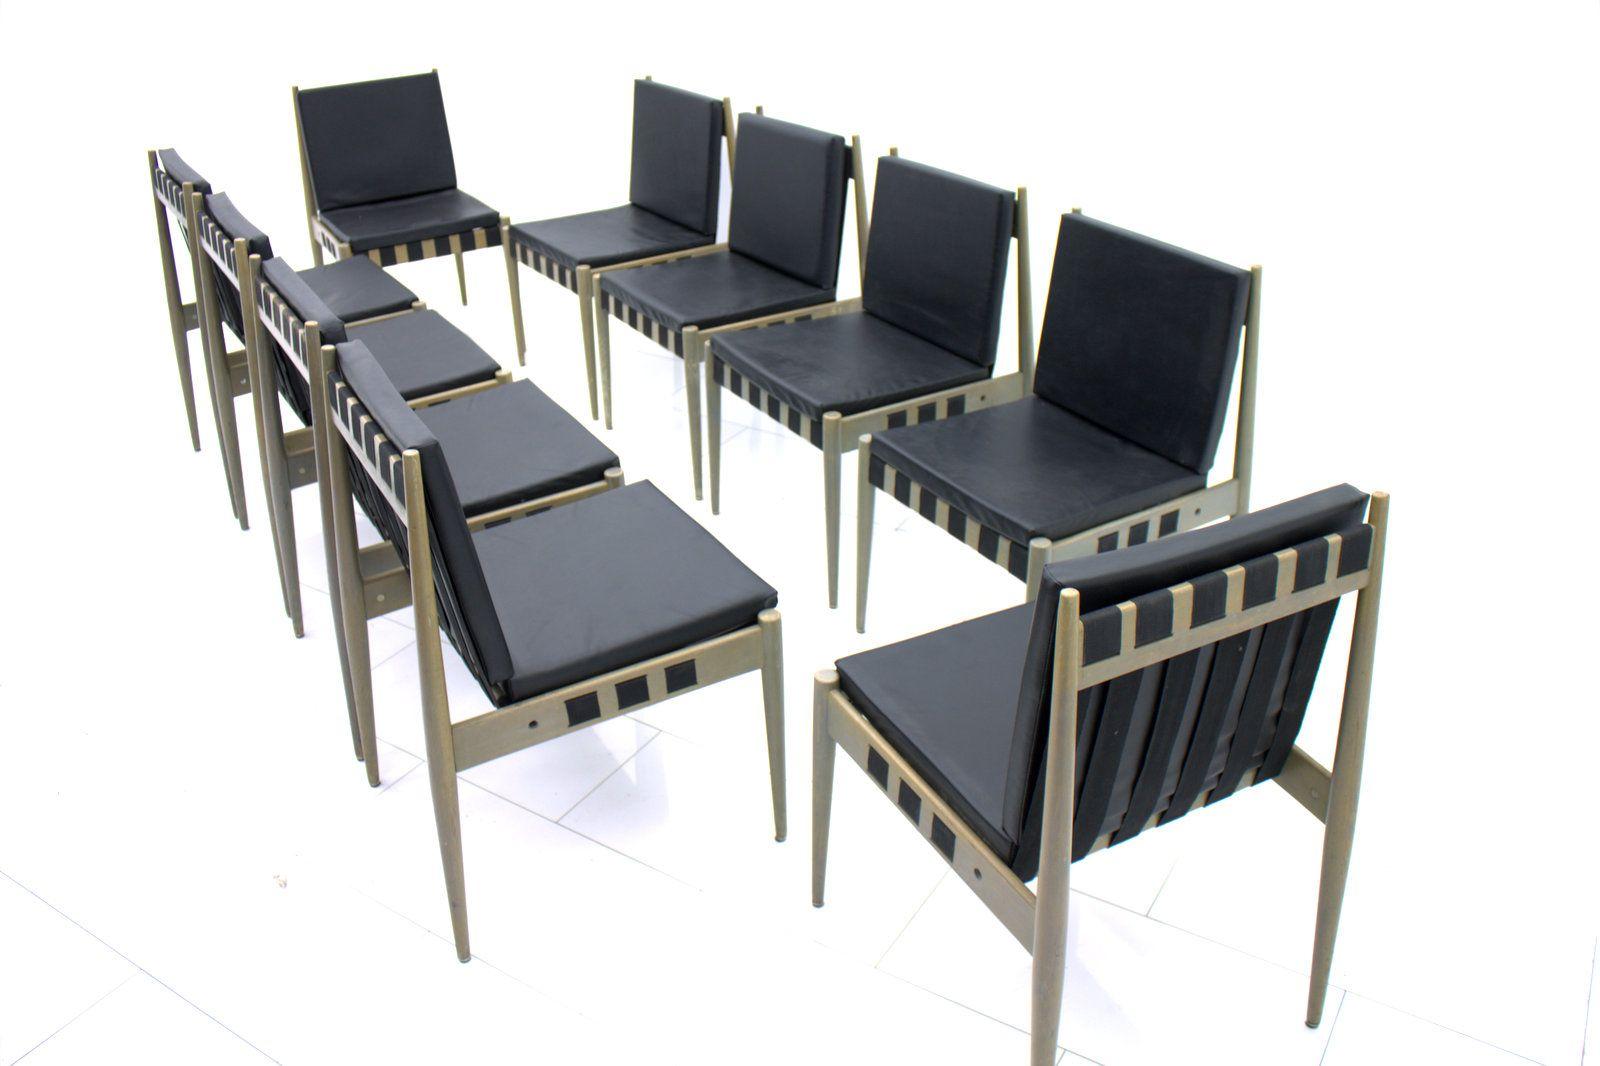 kunstleder se 121 st hle von egon eiermann f r wilde On kunstleder für stühle